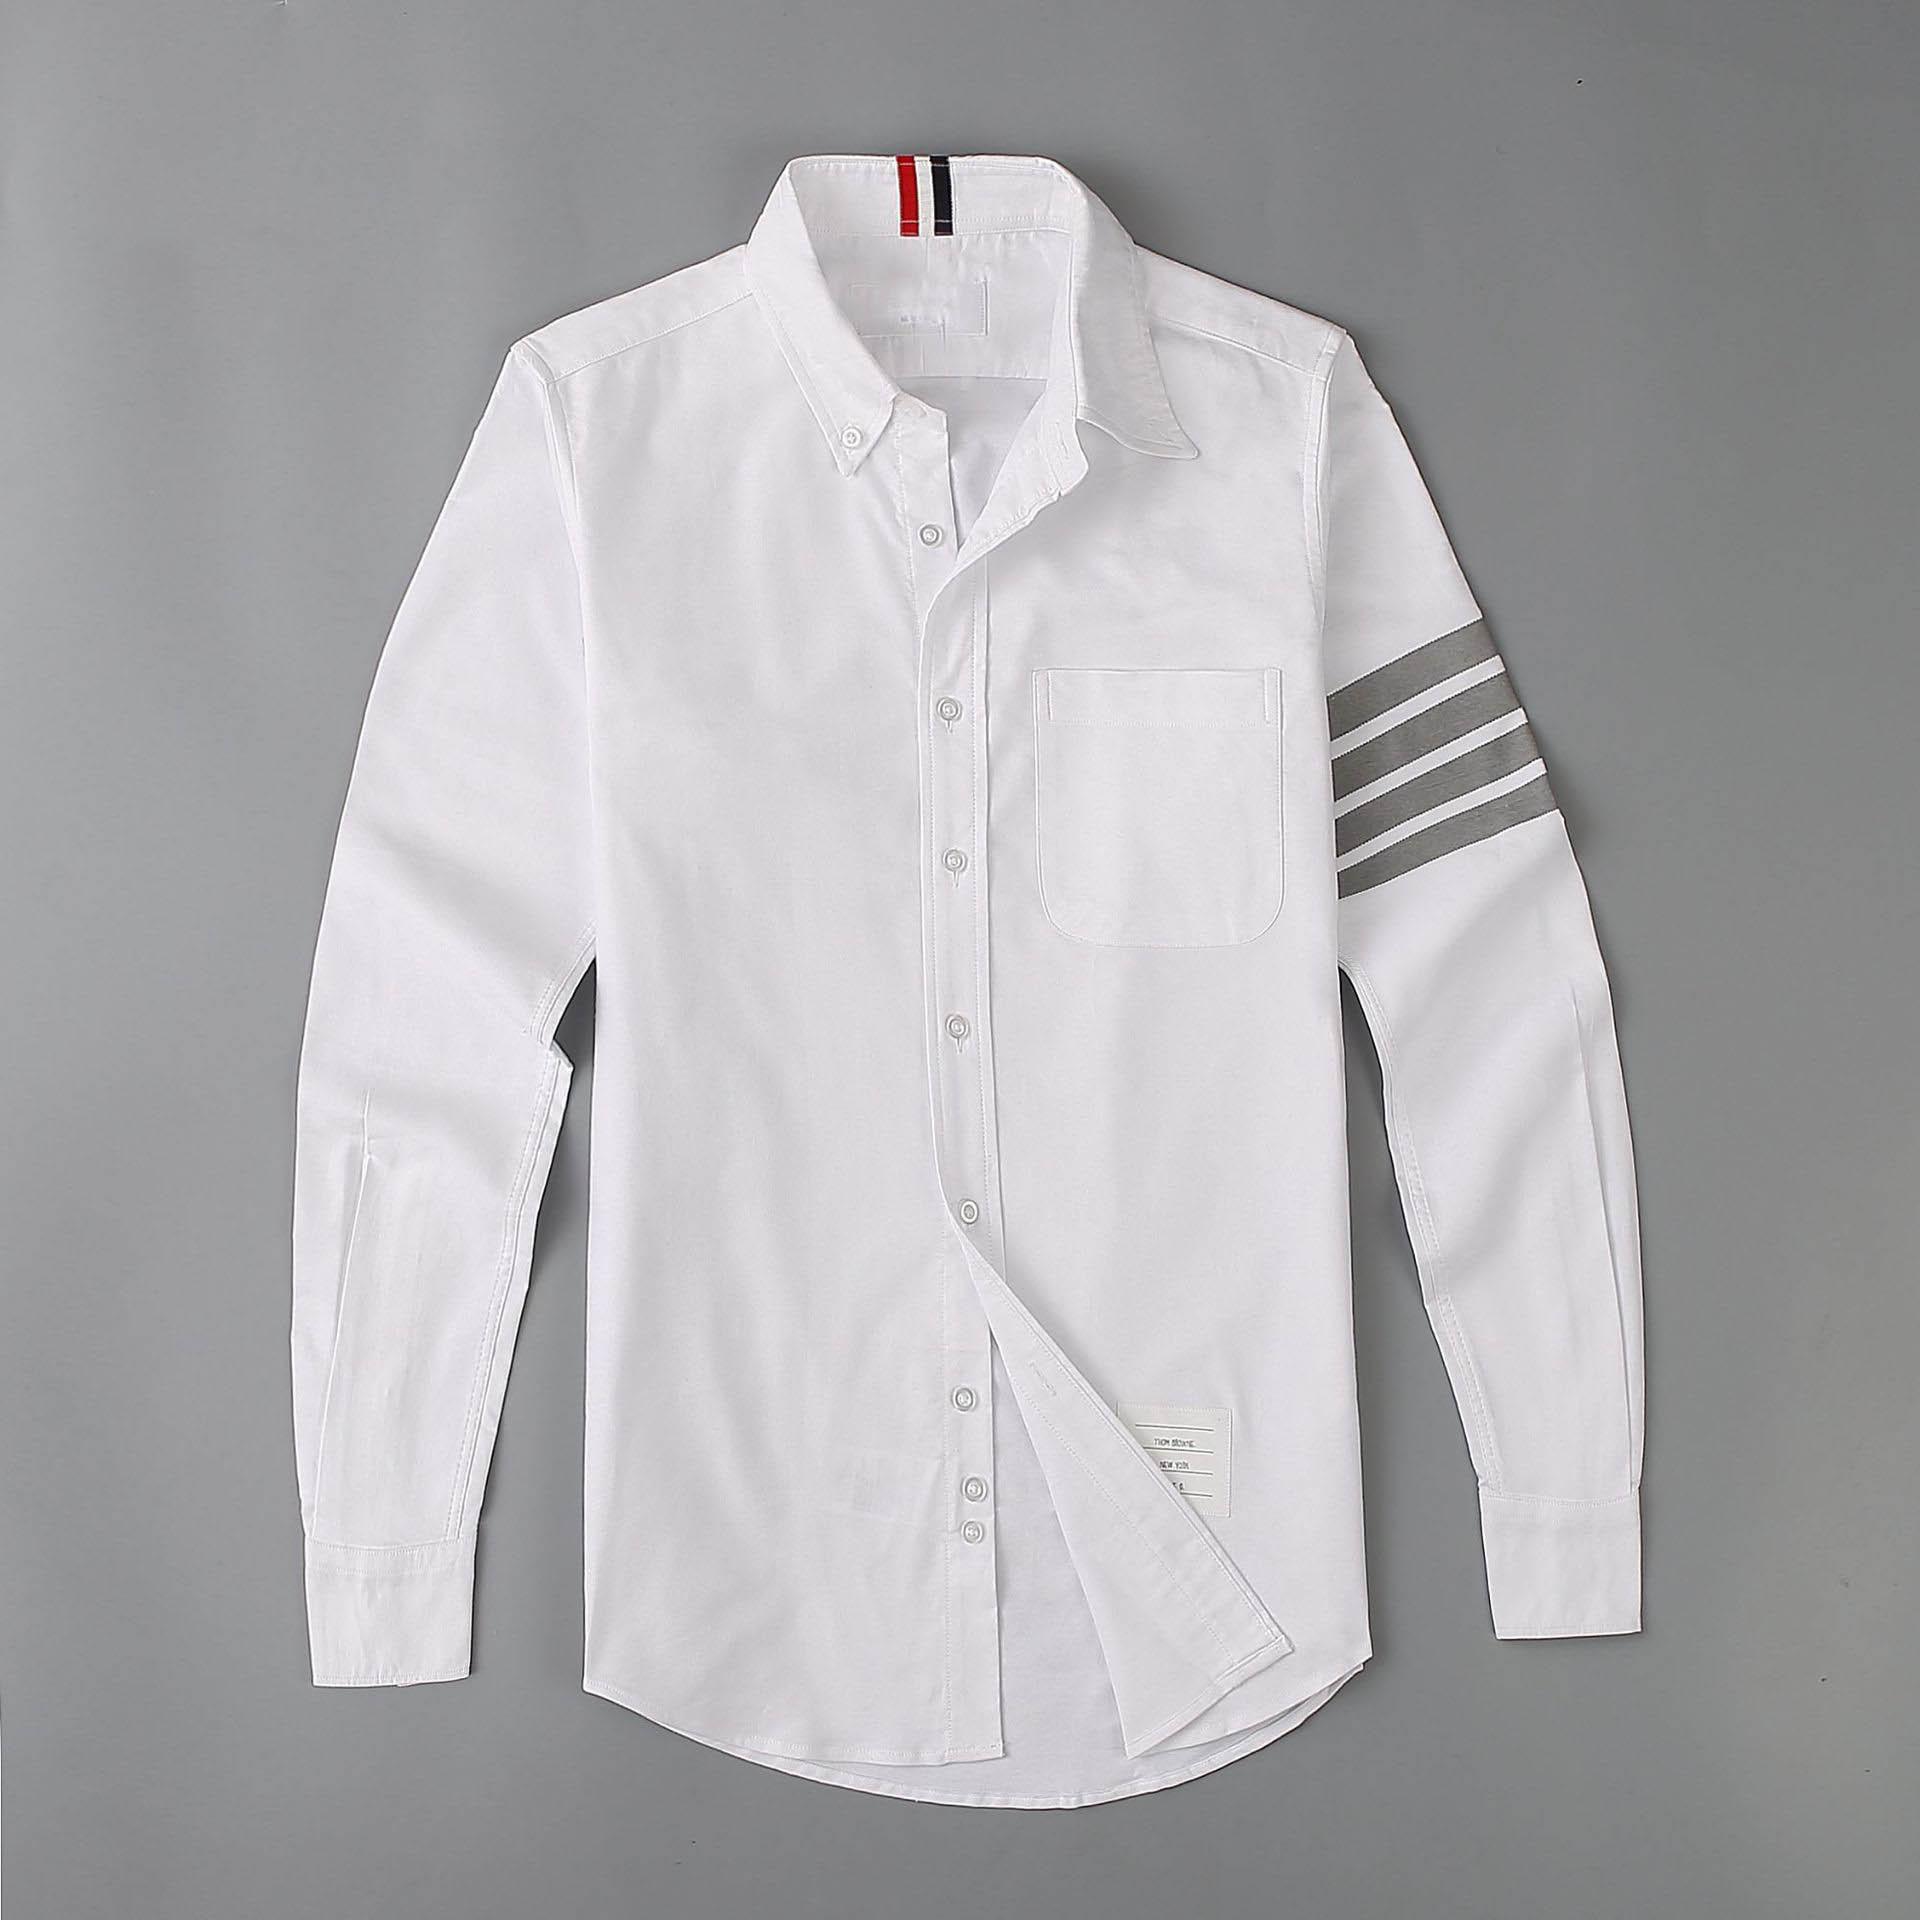 New 19ss Men Oxford Classic Grey Stripe Fashion Cotton Casual Shirts Shirt High Quality Pocket Long-sleeves Top M 2XL #M49